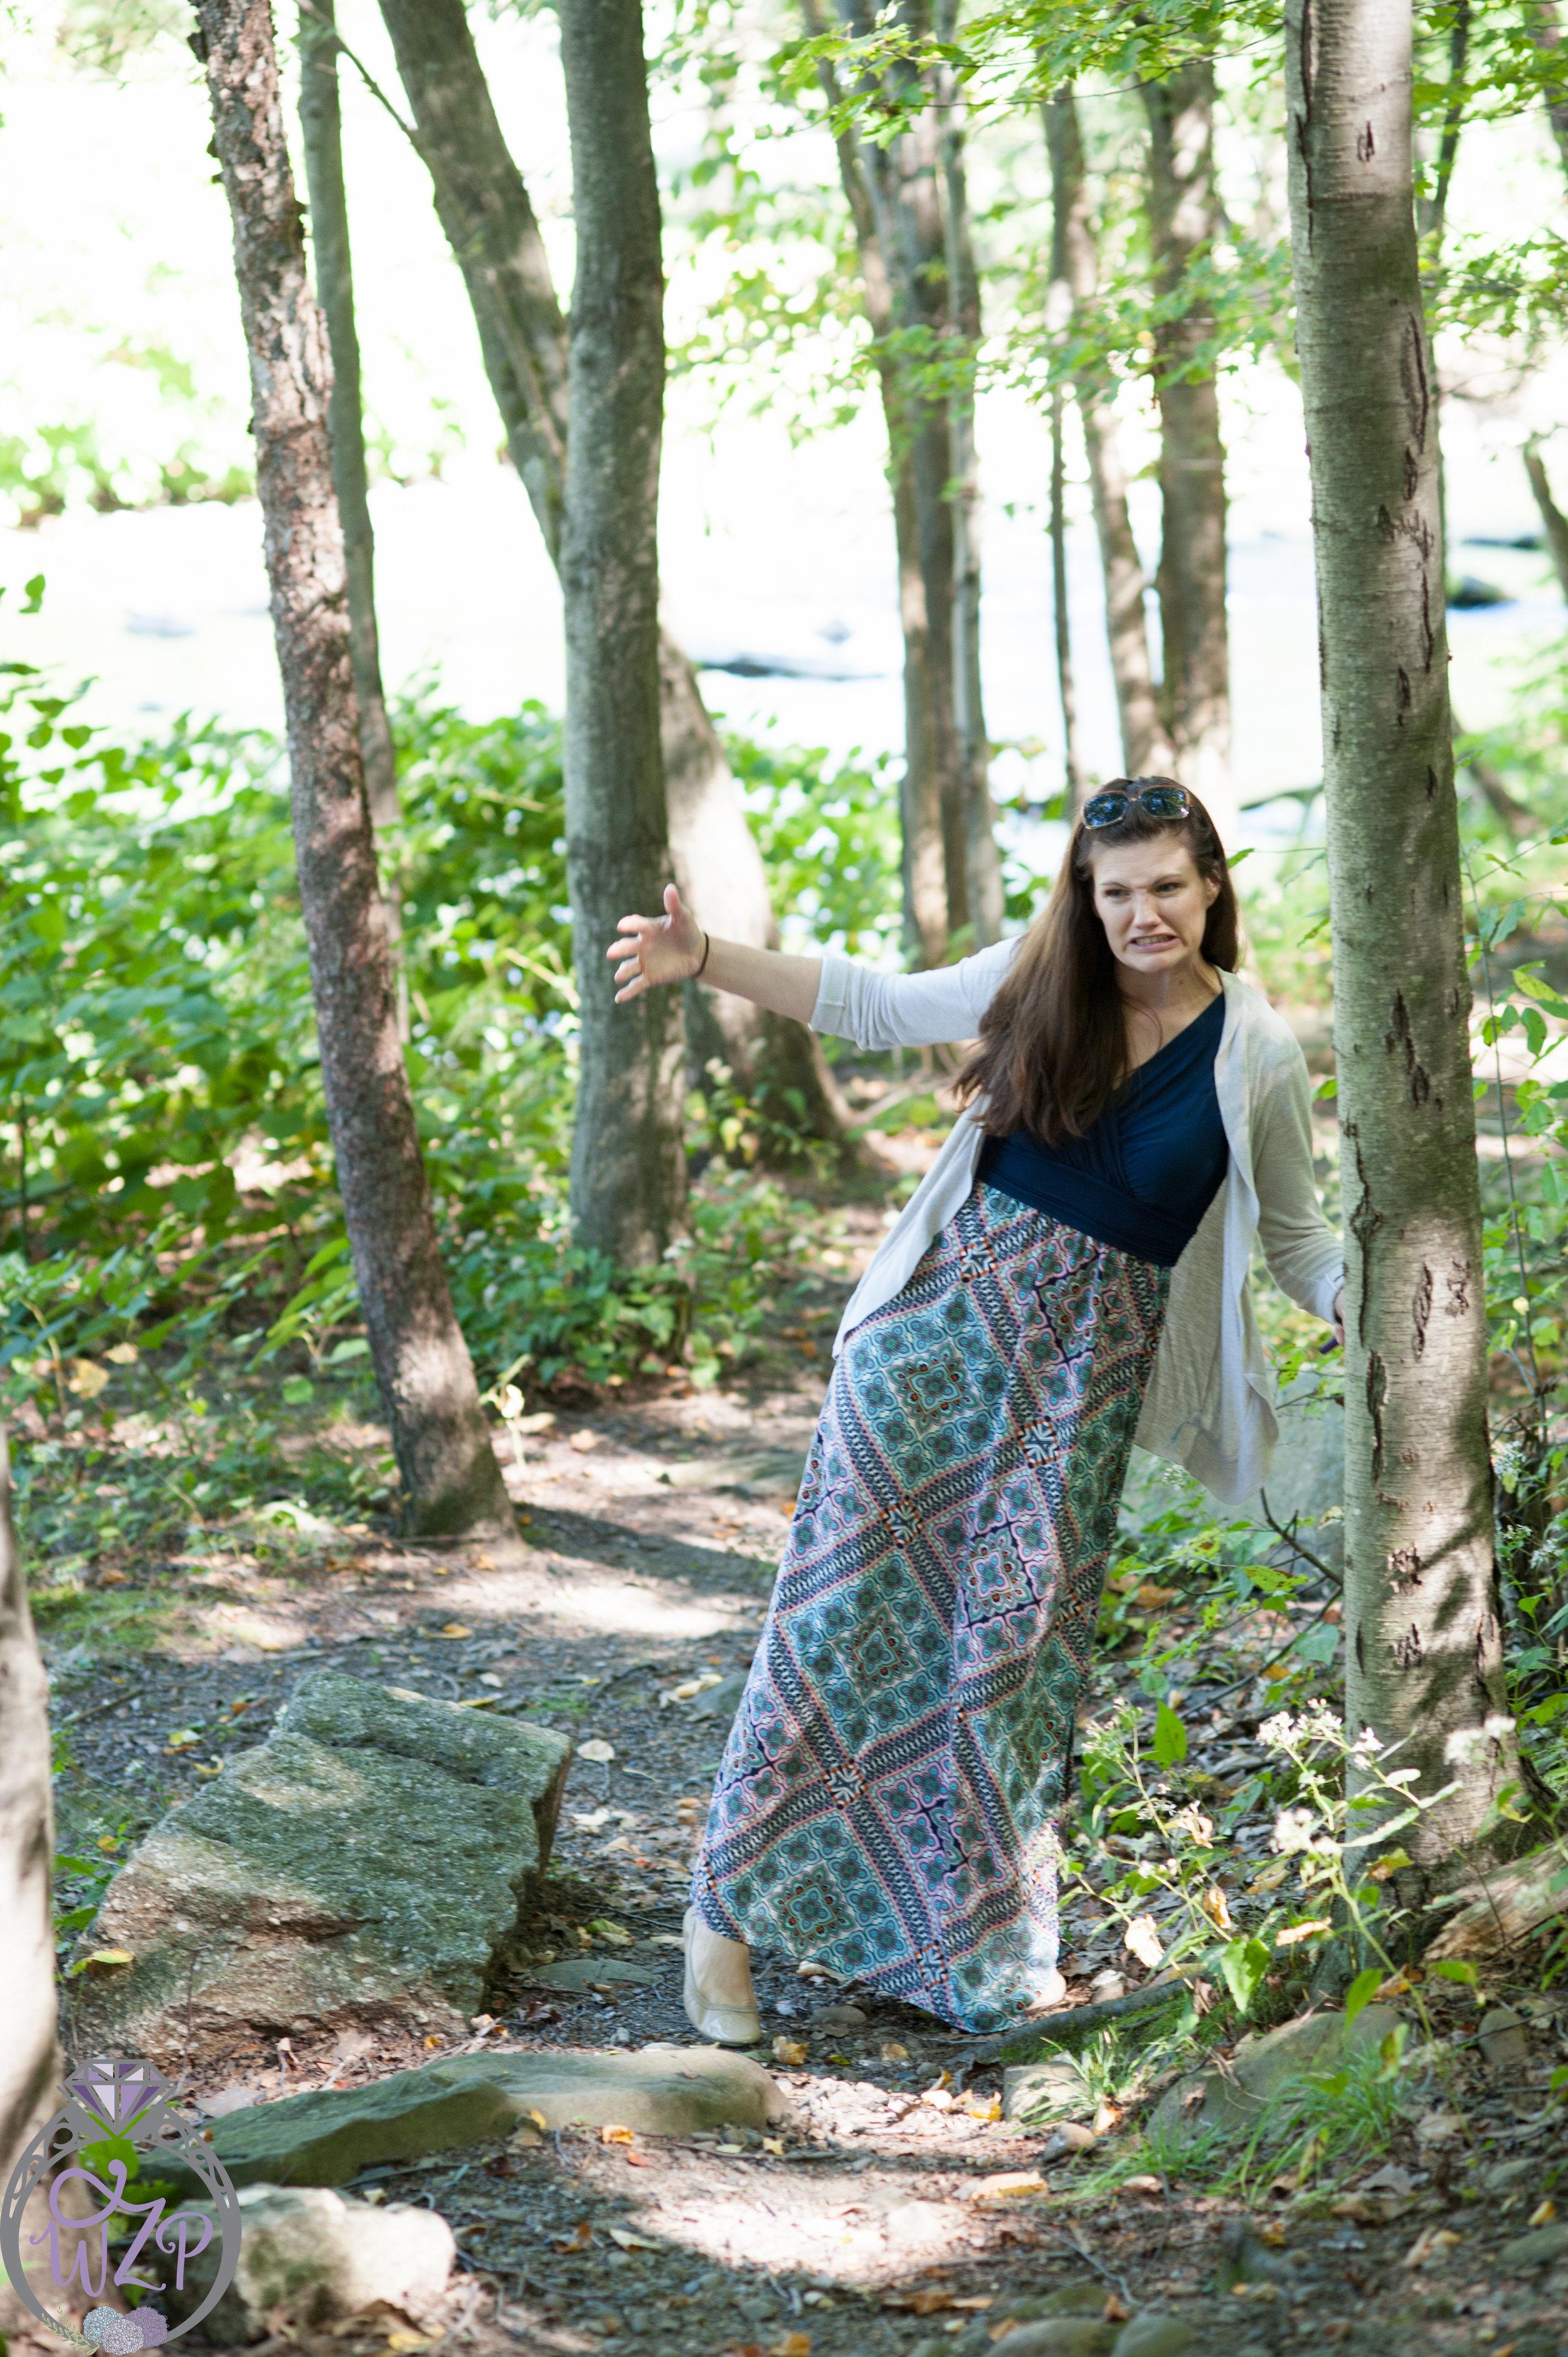 MelissaPatrick - Staceys-15-3.jpg